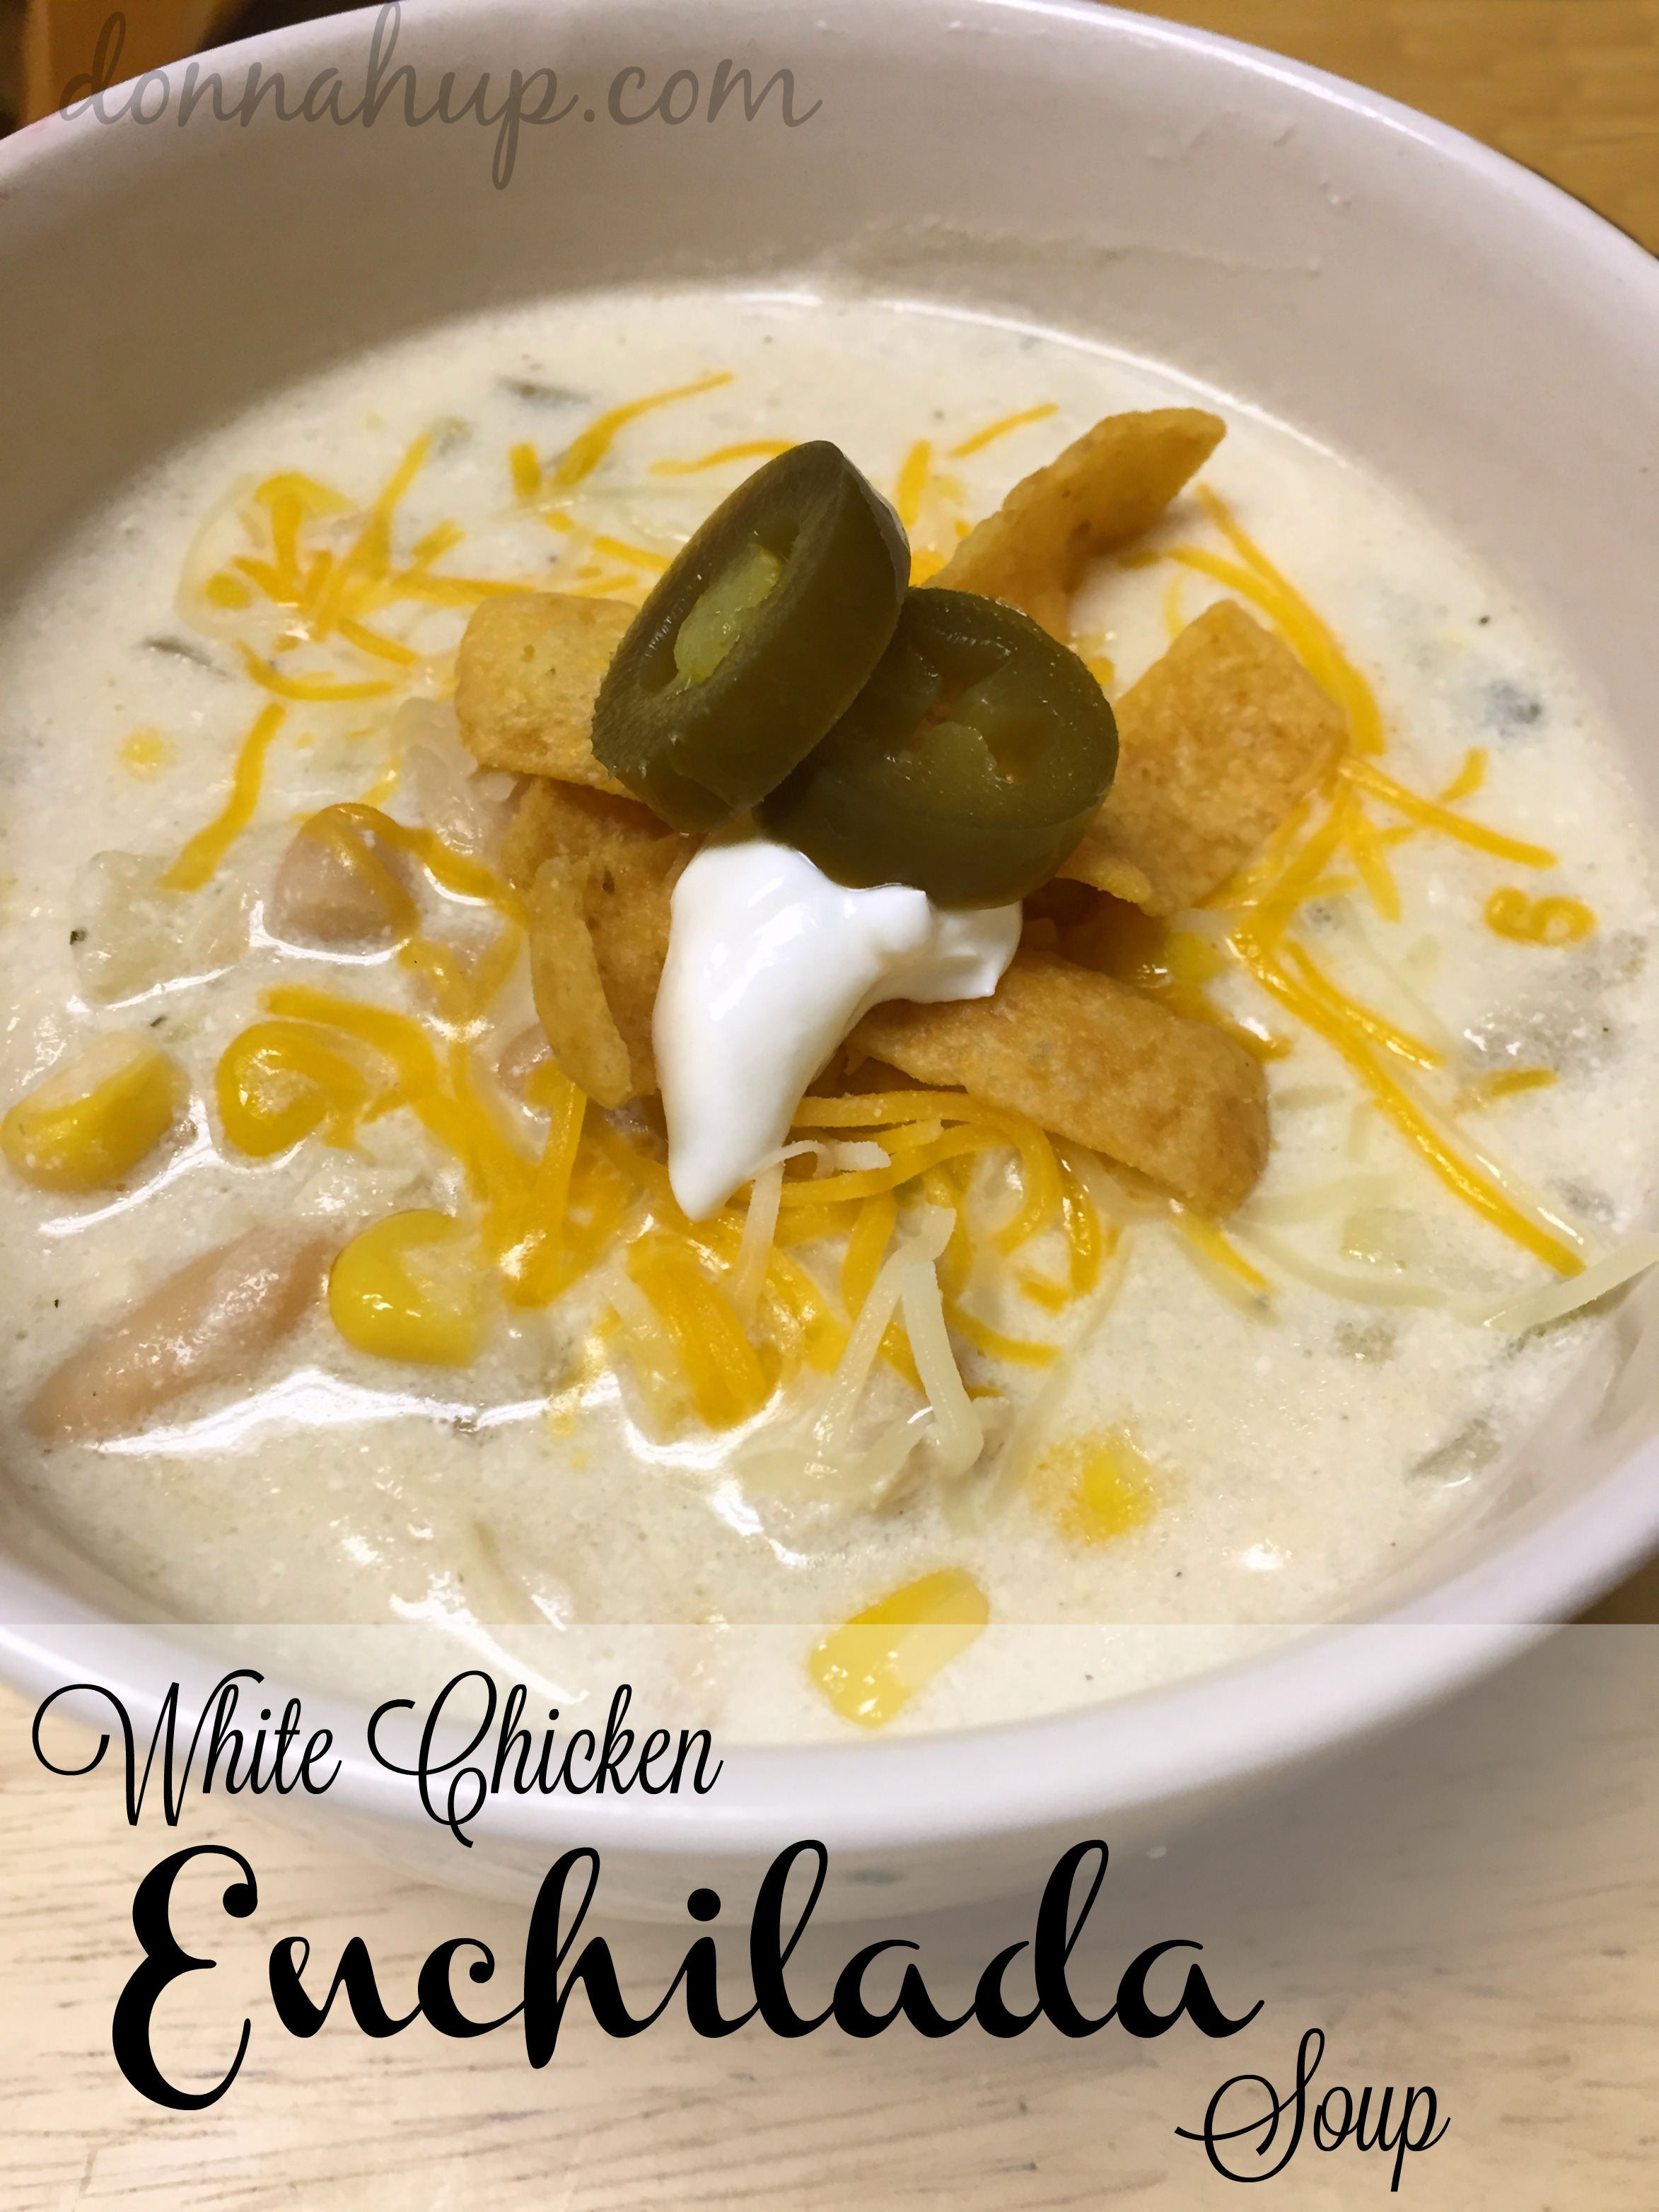 White Chicken Enchilada Soup